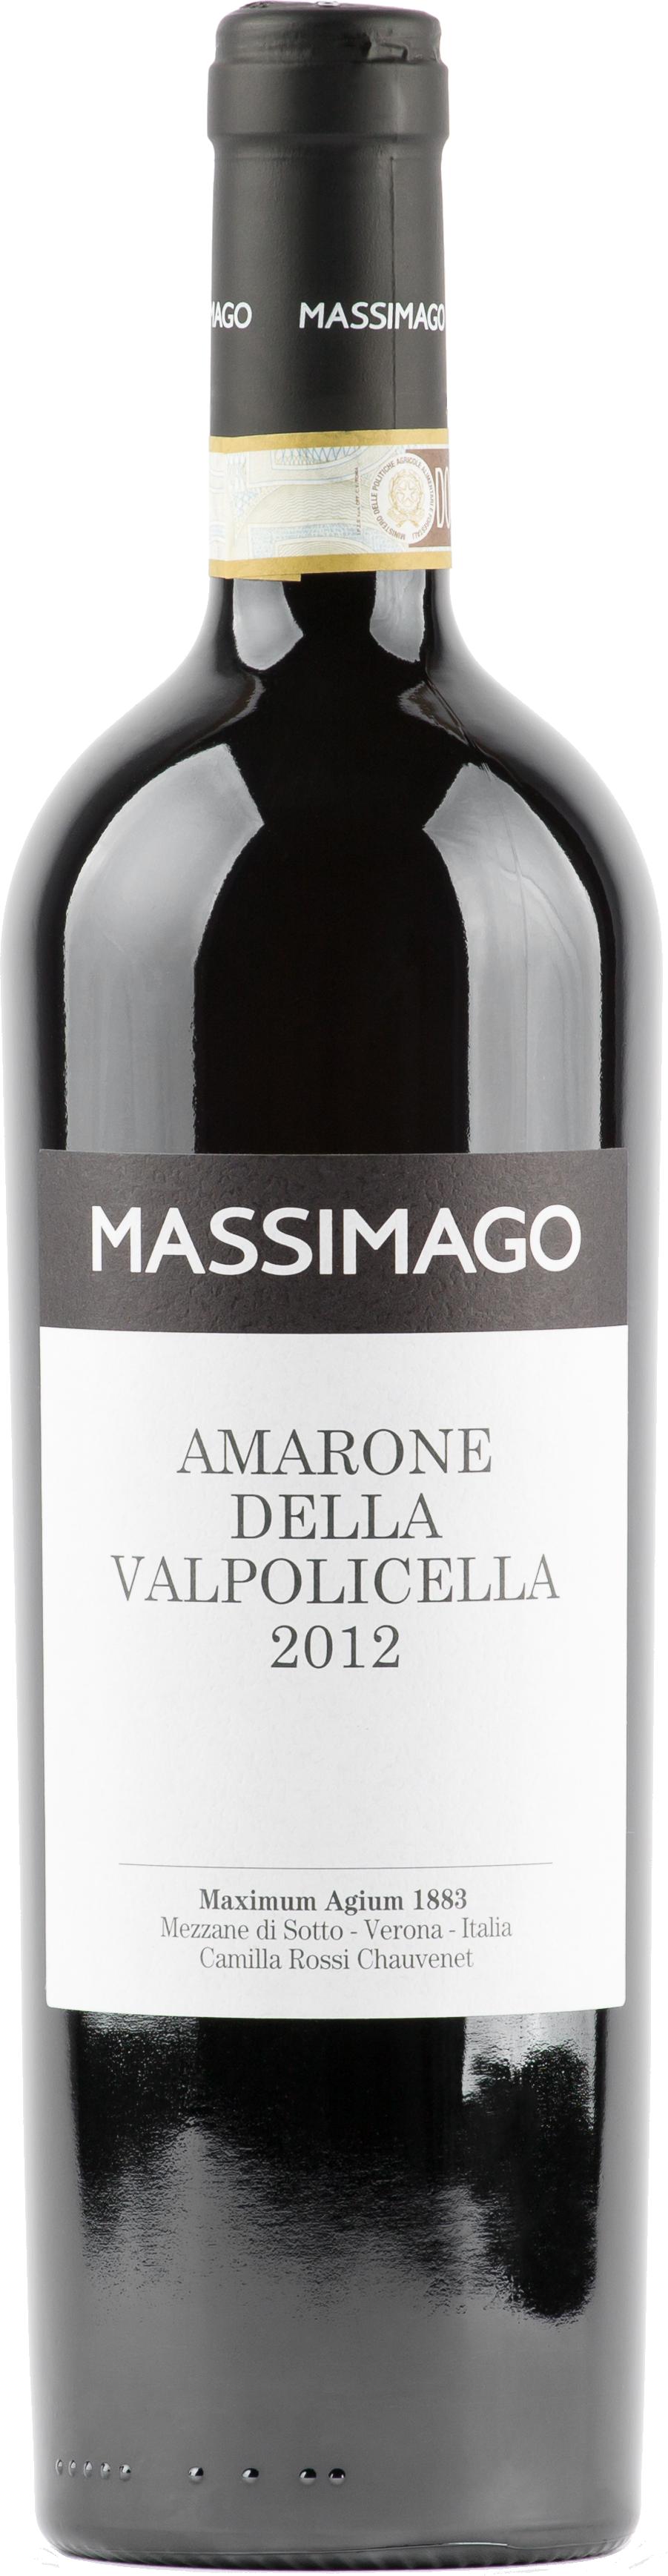 2012 Massimago Amazon Della Valpolicella.png